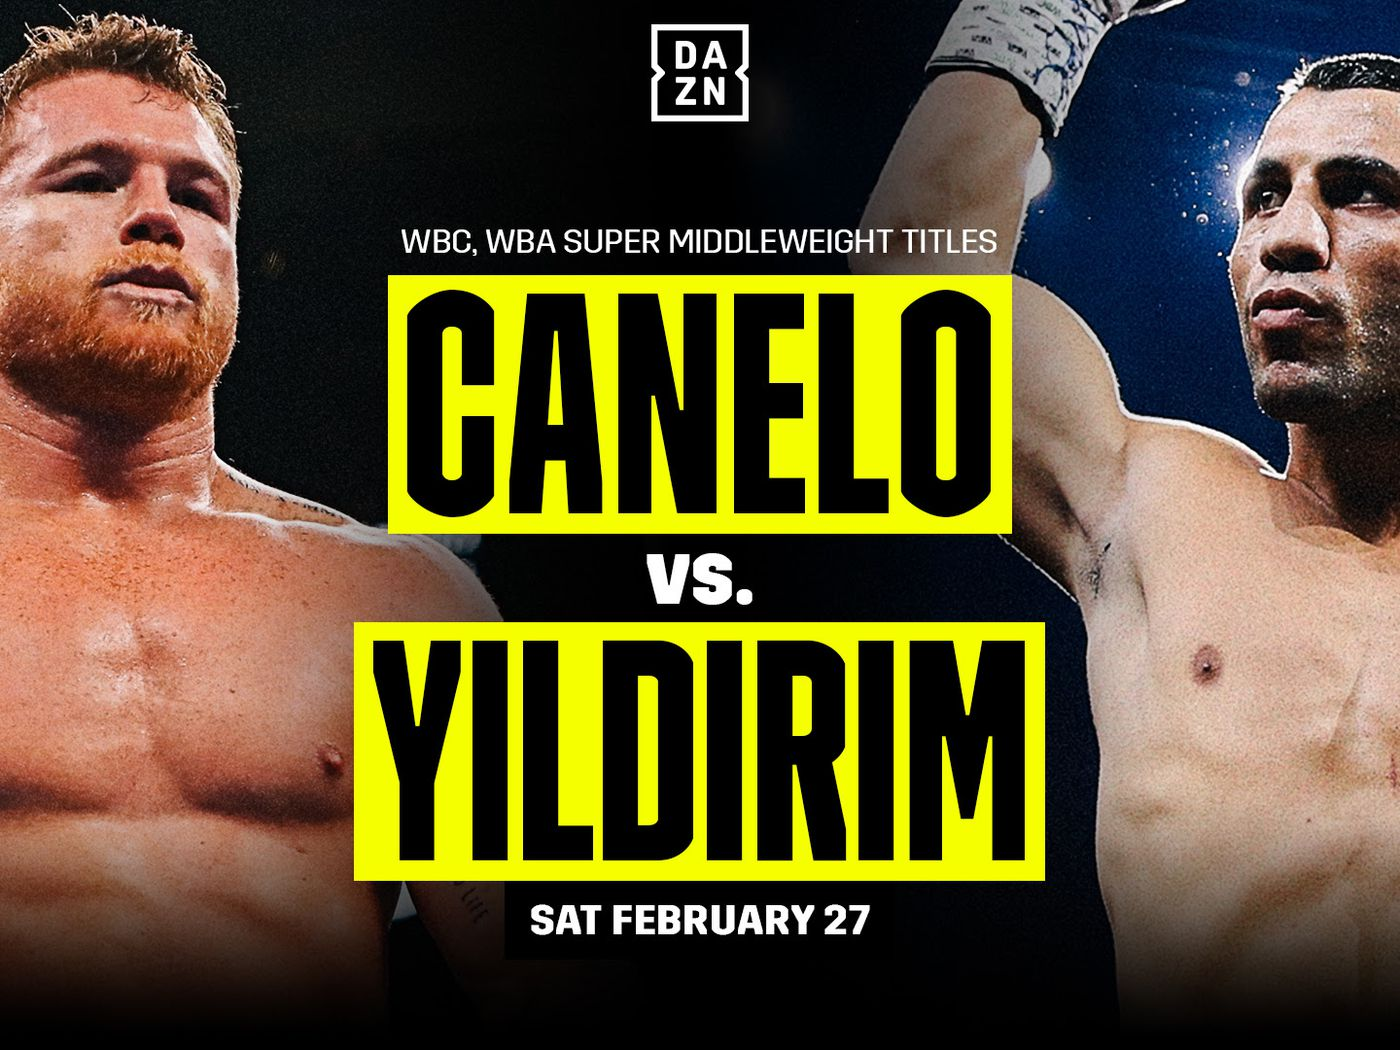 Canelo Alvarez next fight: Yildirim bout official for Feb. 27 - Bad Left Hook